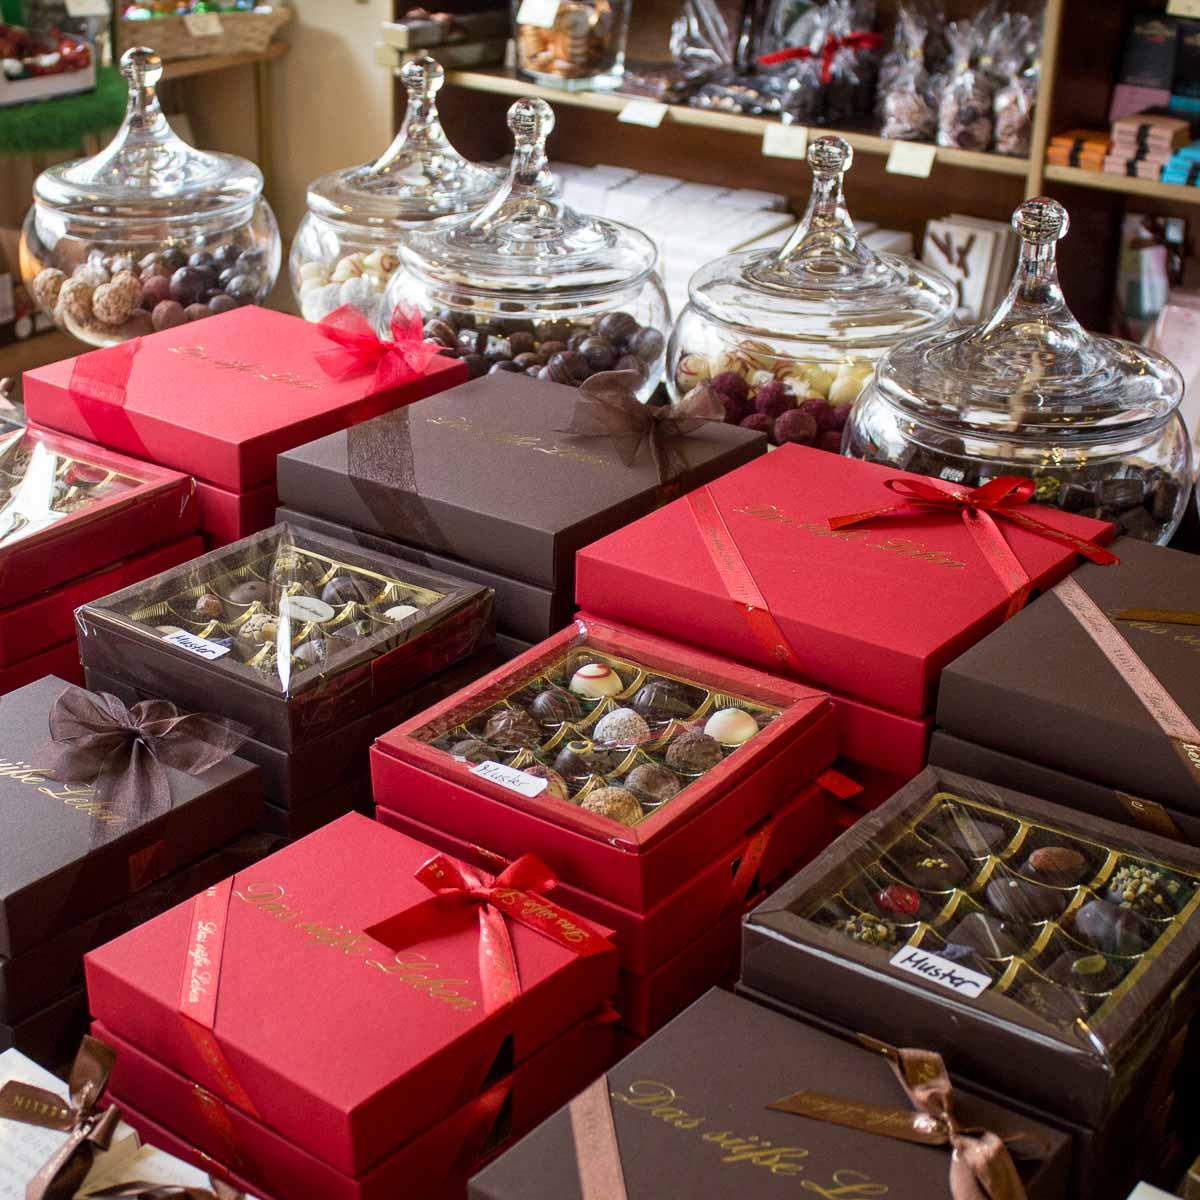 Das süße Leben Schokoladen & Pralinen in Berlin-Schöneberg-3